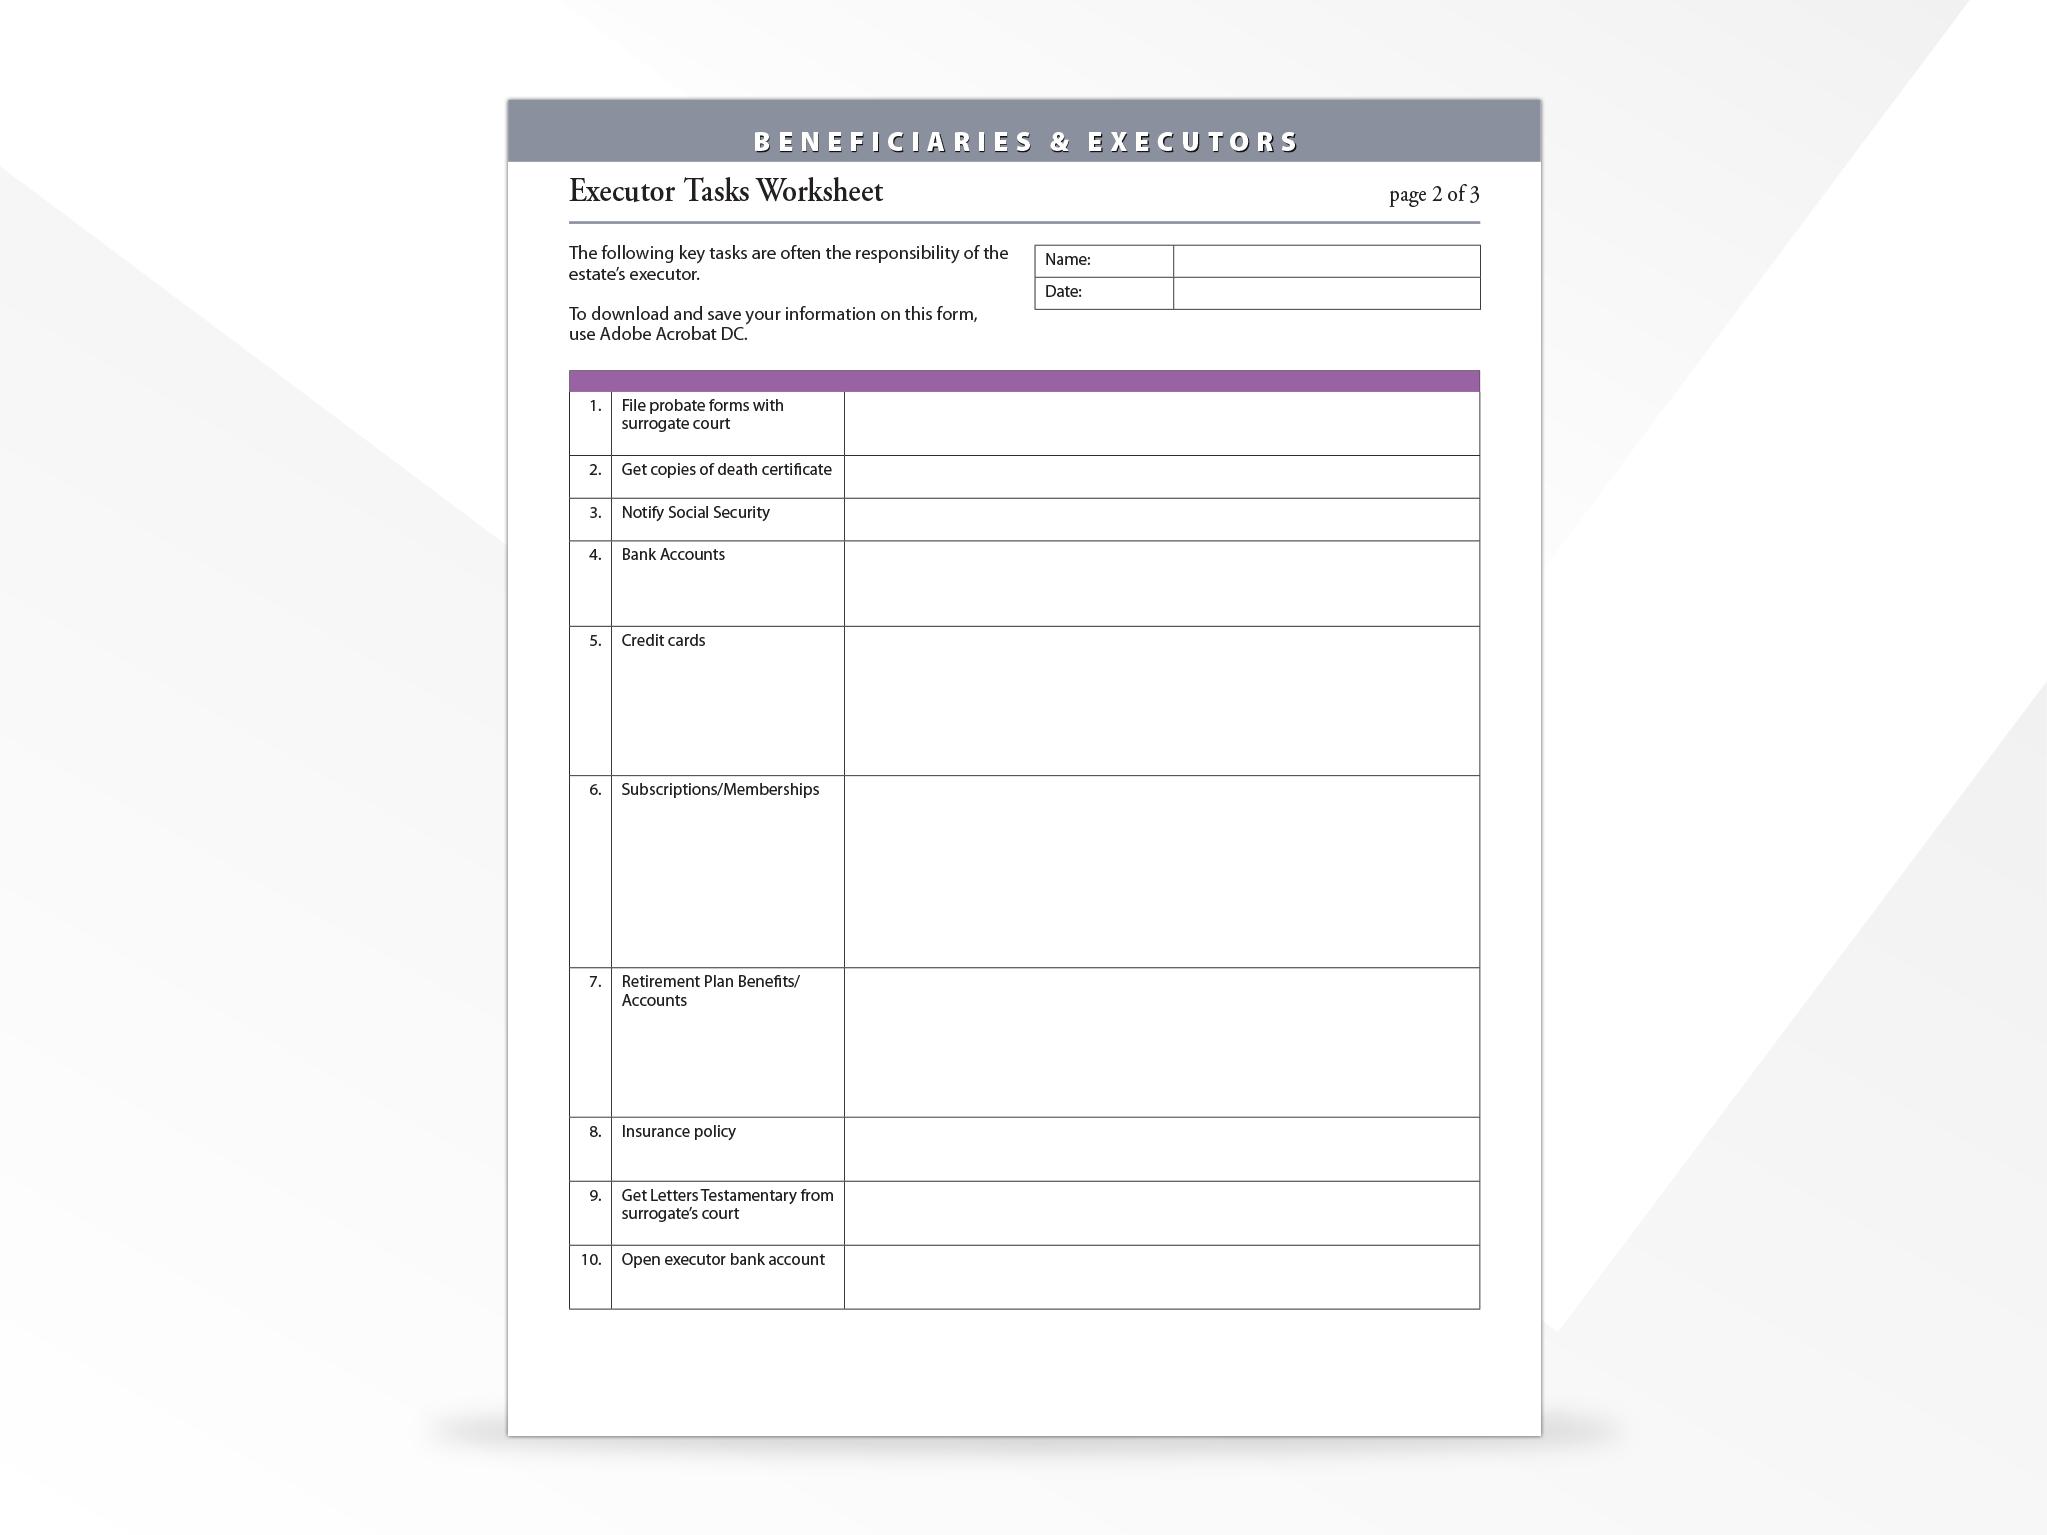 executortasks-worksheet.png